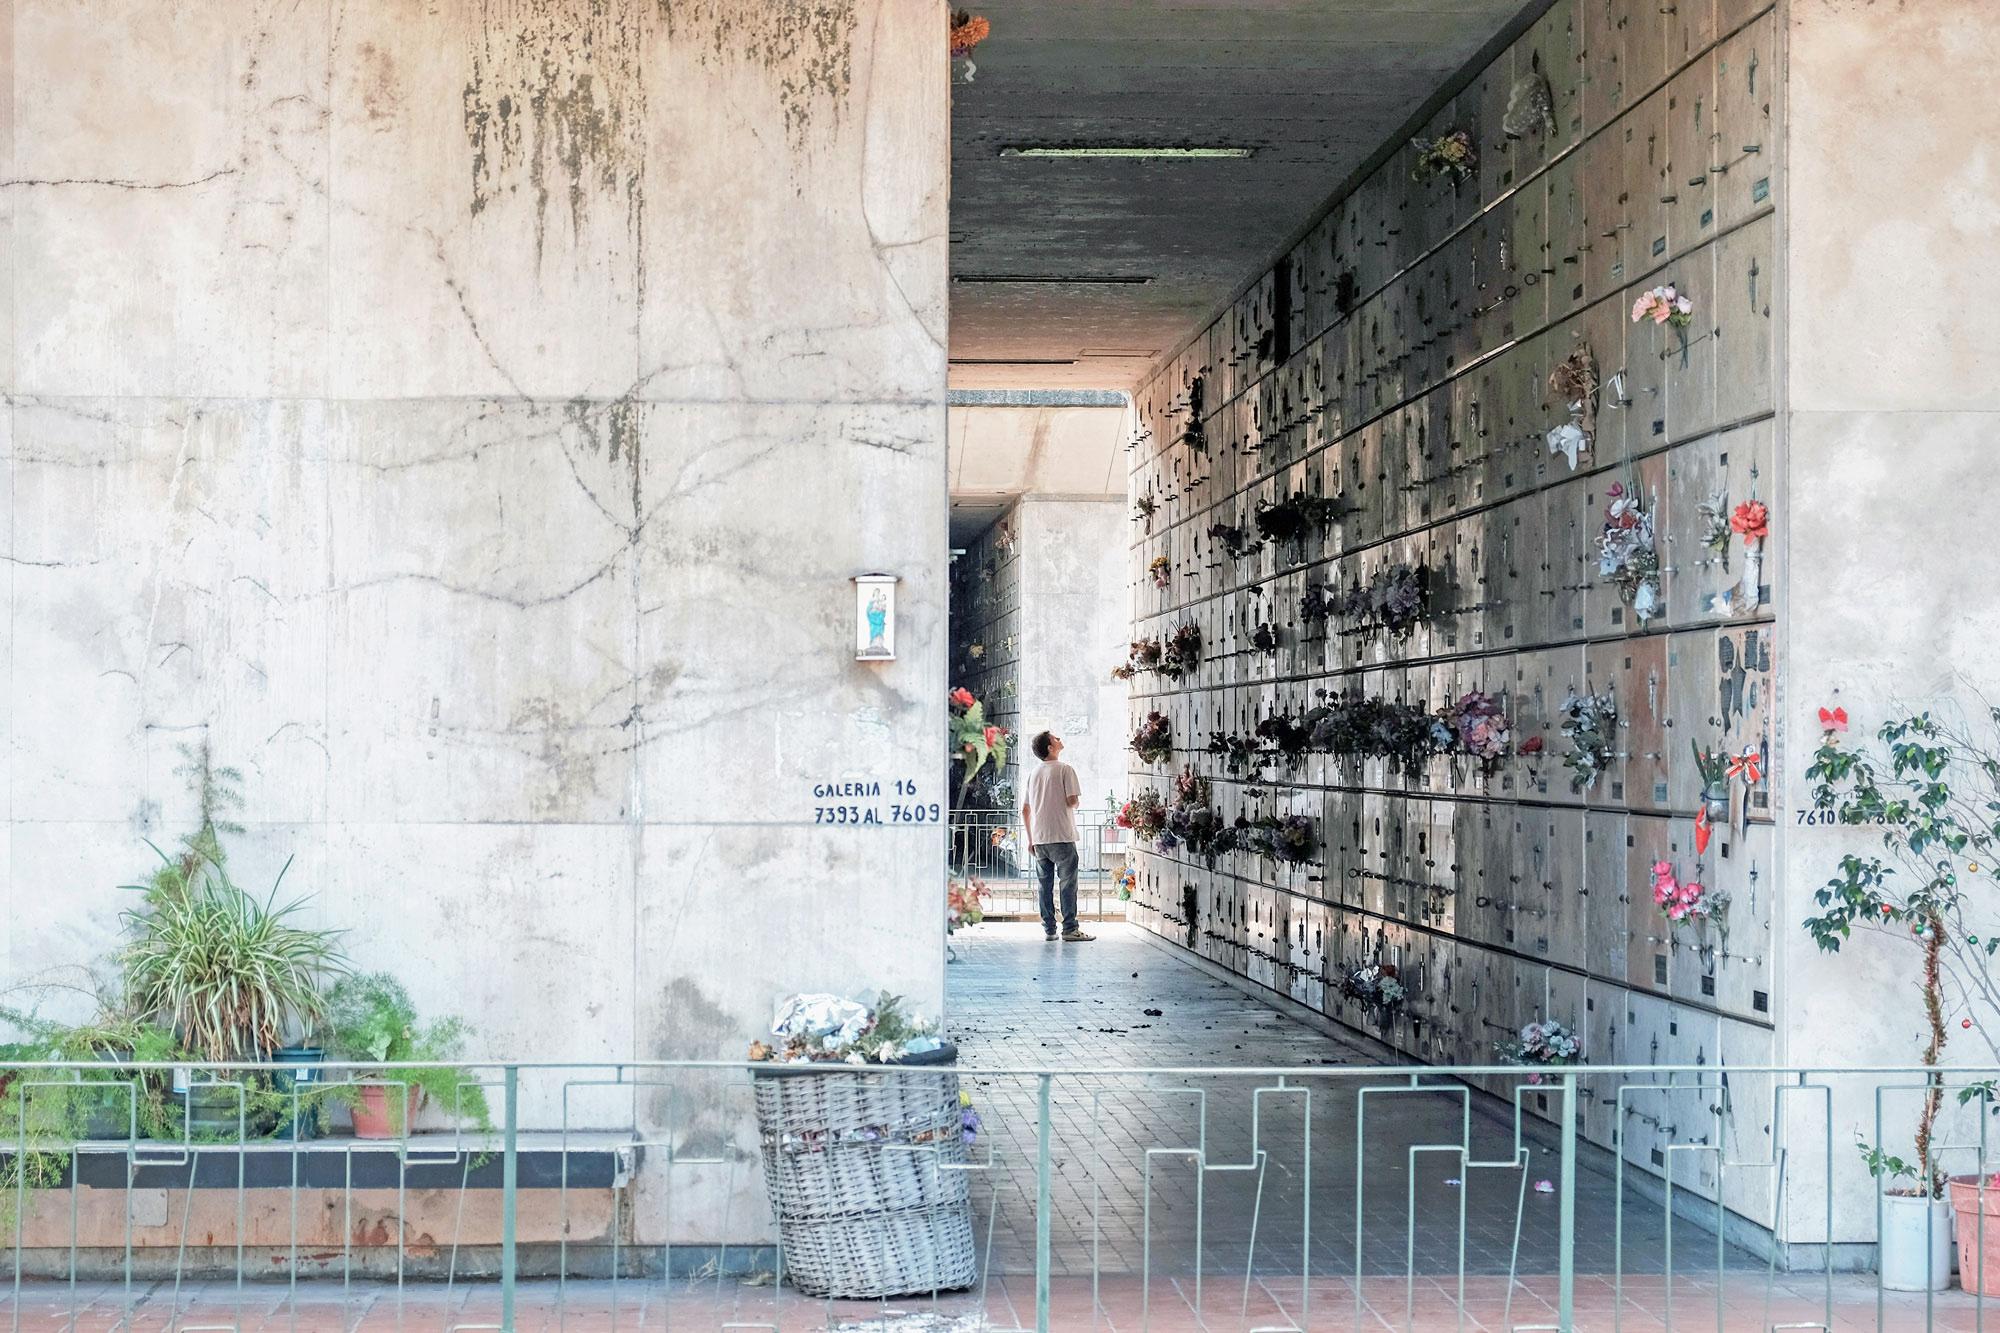 chacarita-cemetery-2.jpg